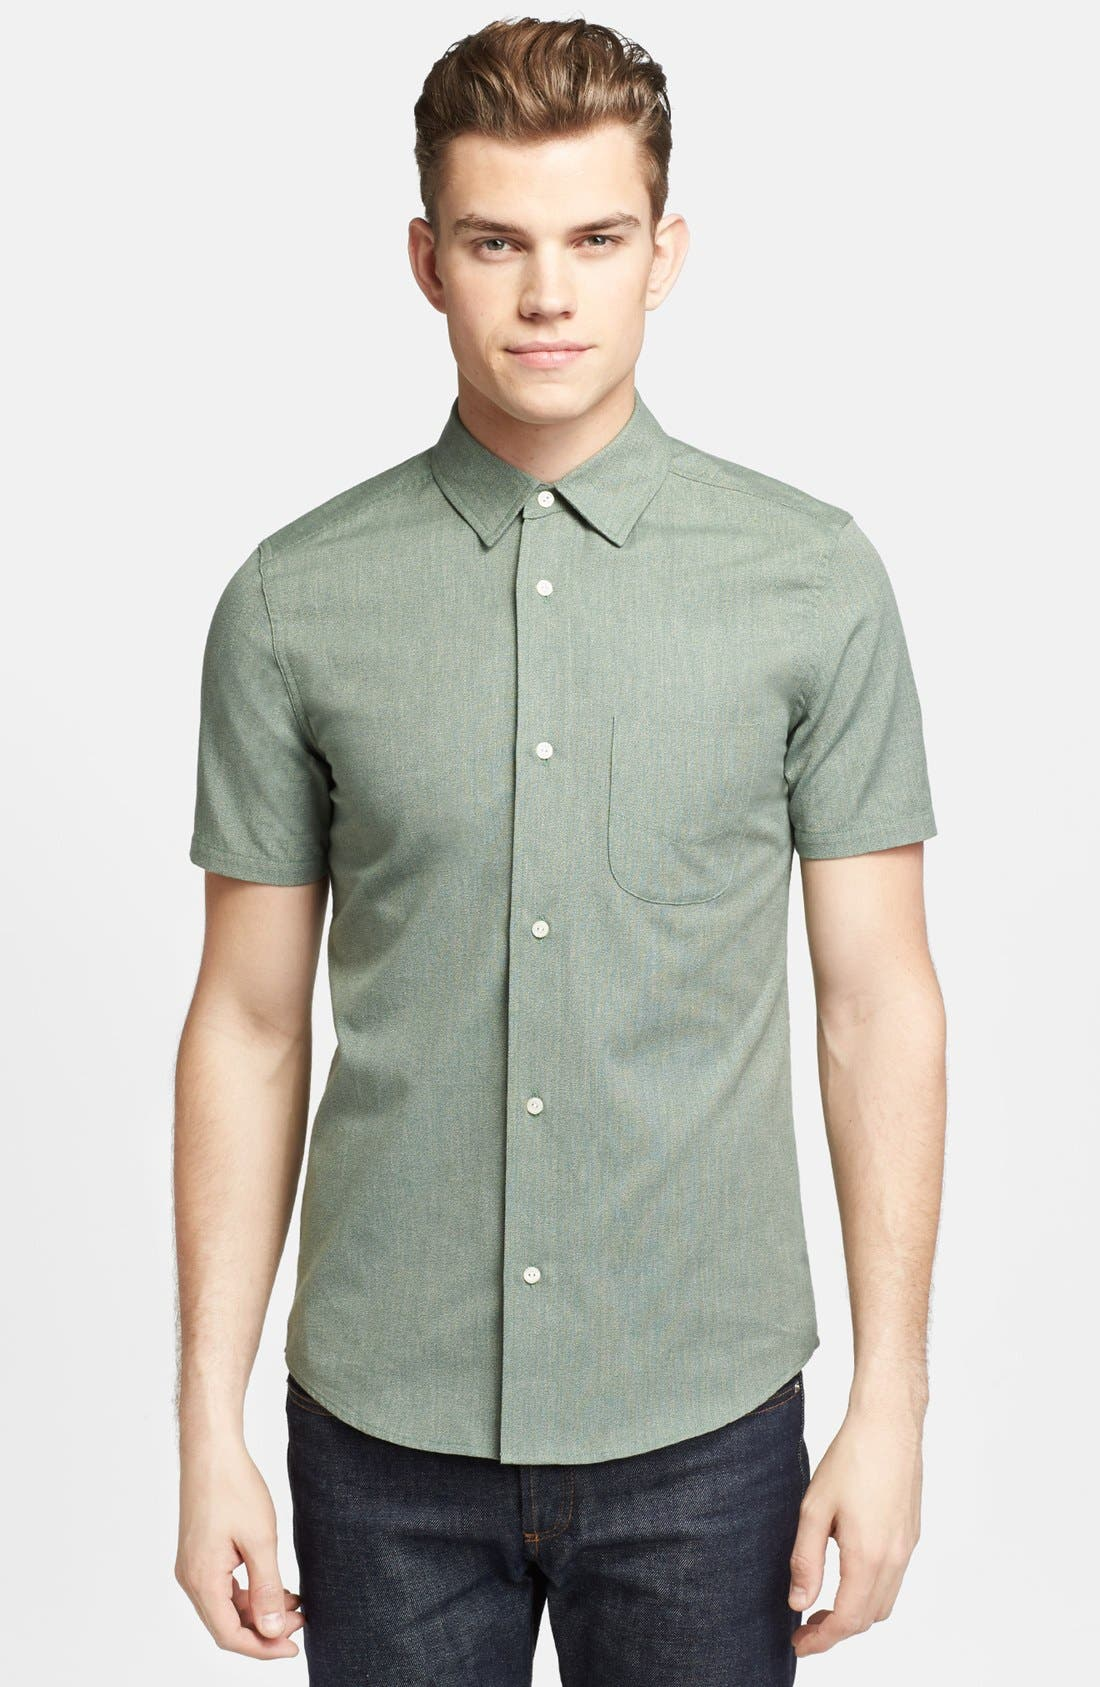 Main Image - Pendleton Portland Collection 'Yachats' Short Sleeve Selvedge Poplin Shirt